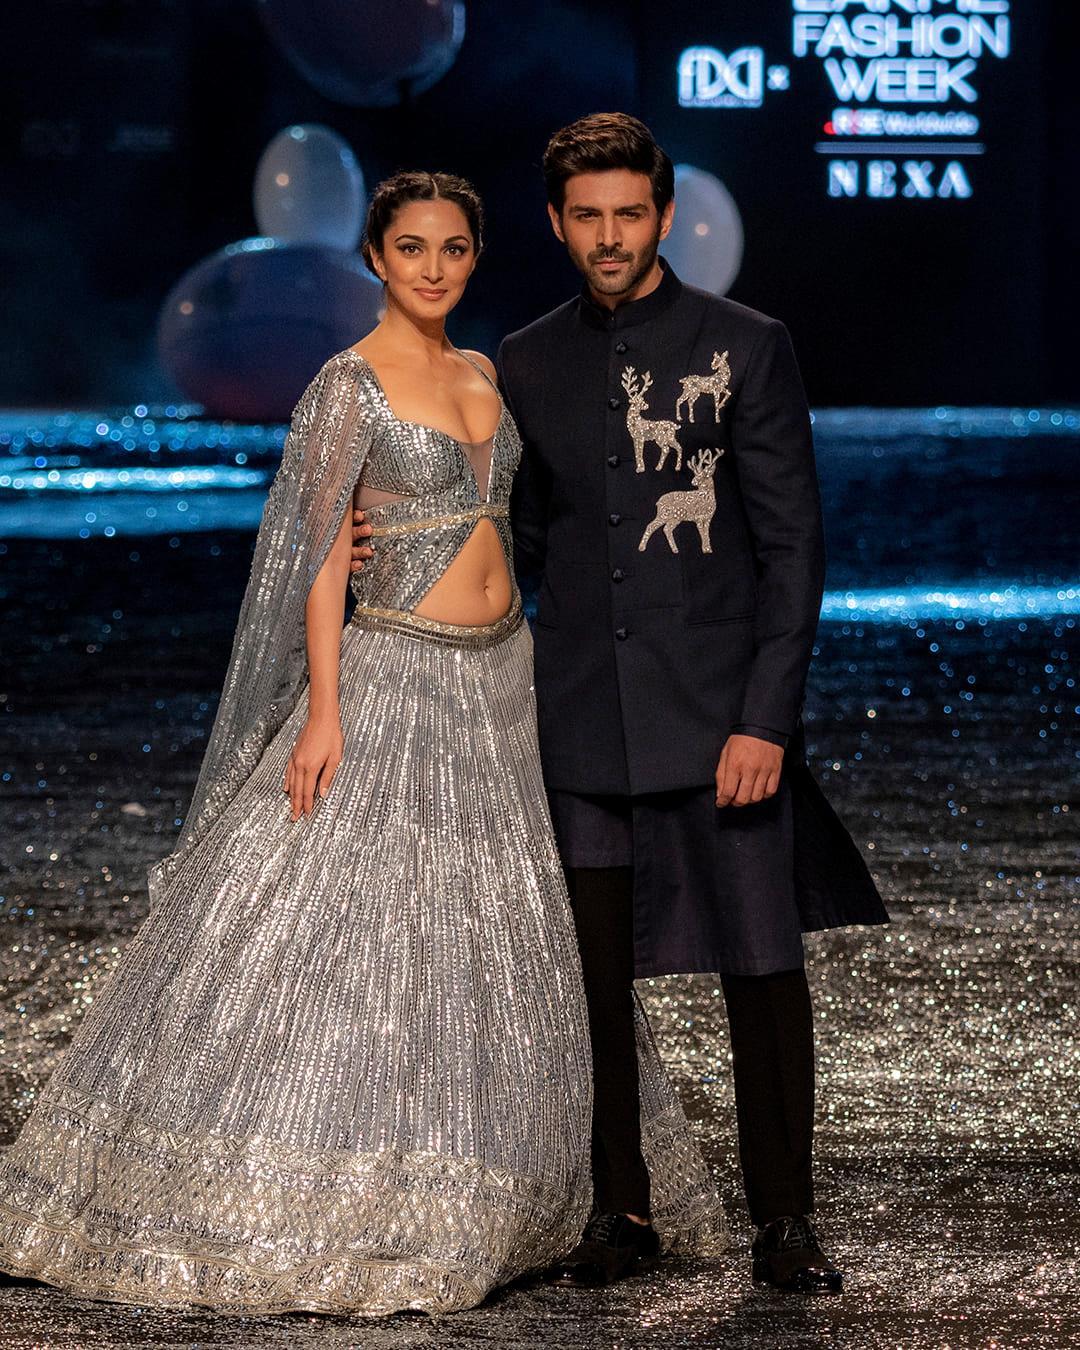 Kiara Advani & Kartik Aryan in Manish Malhotra